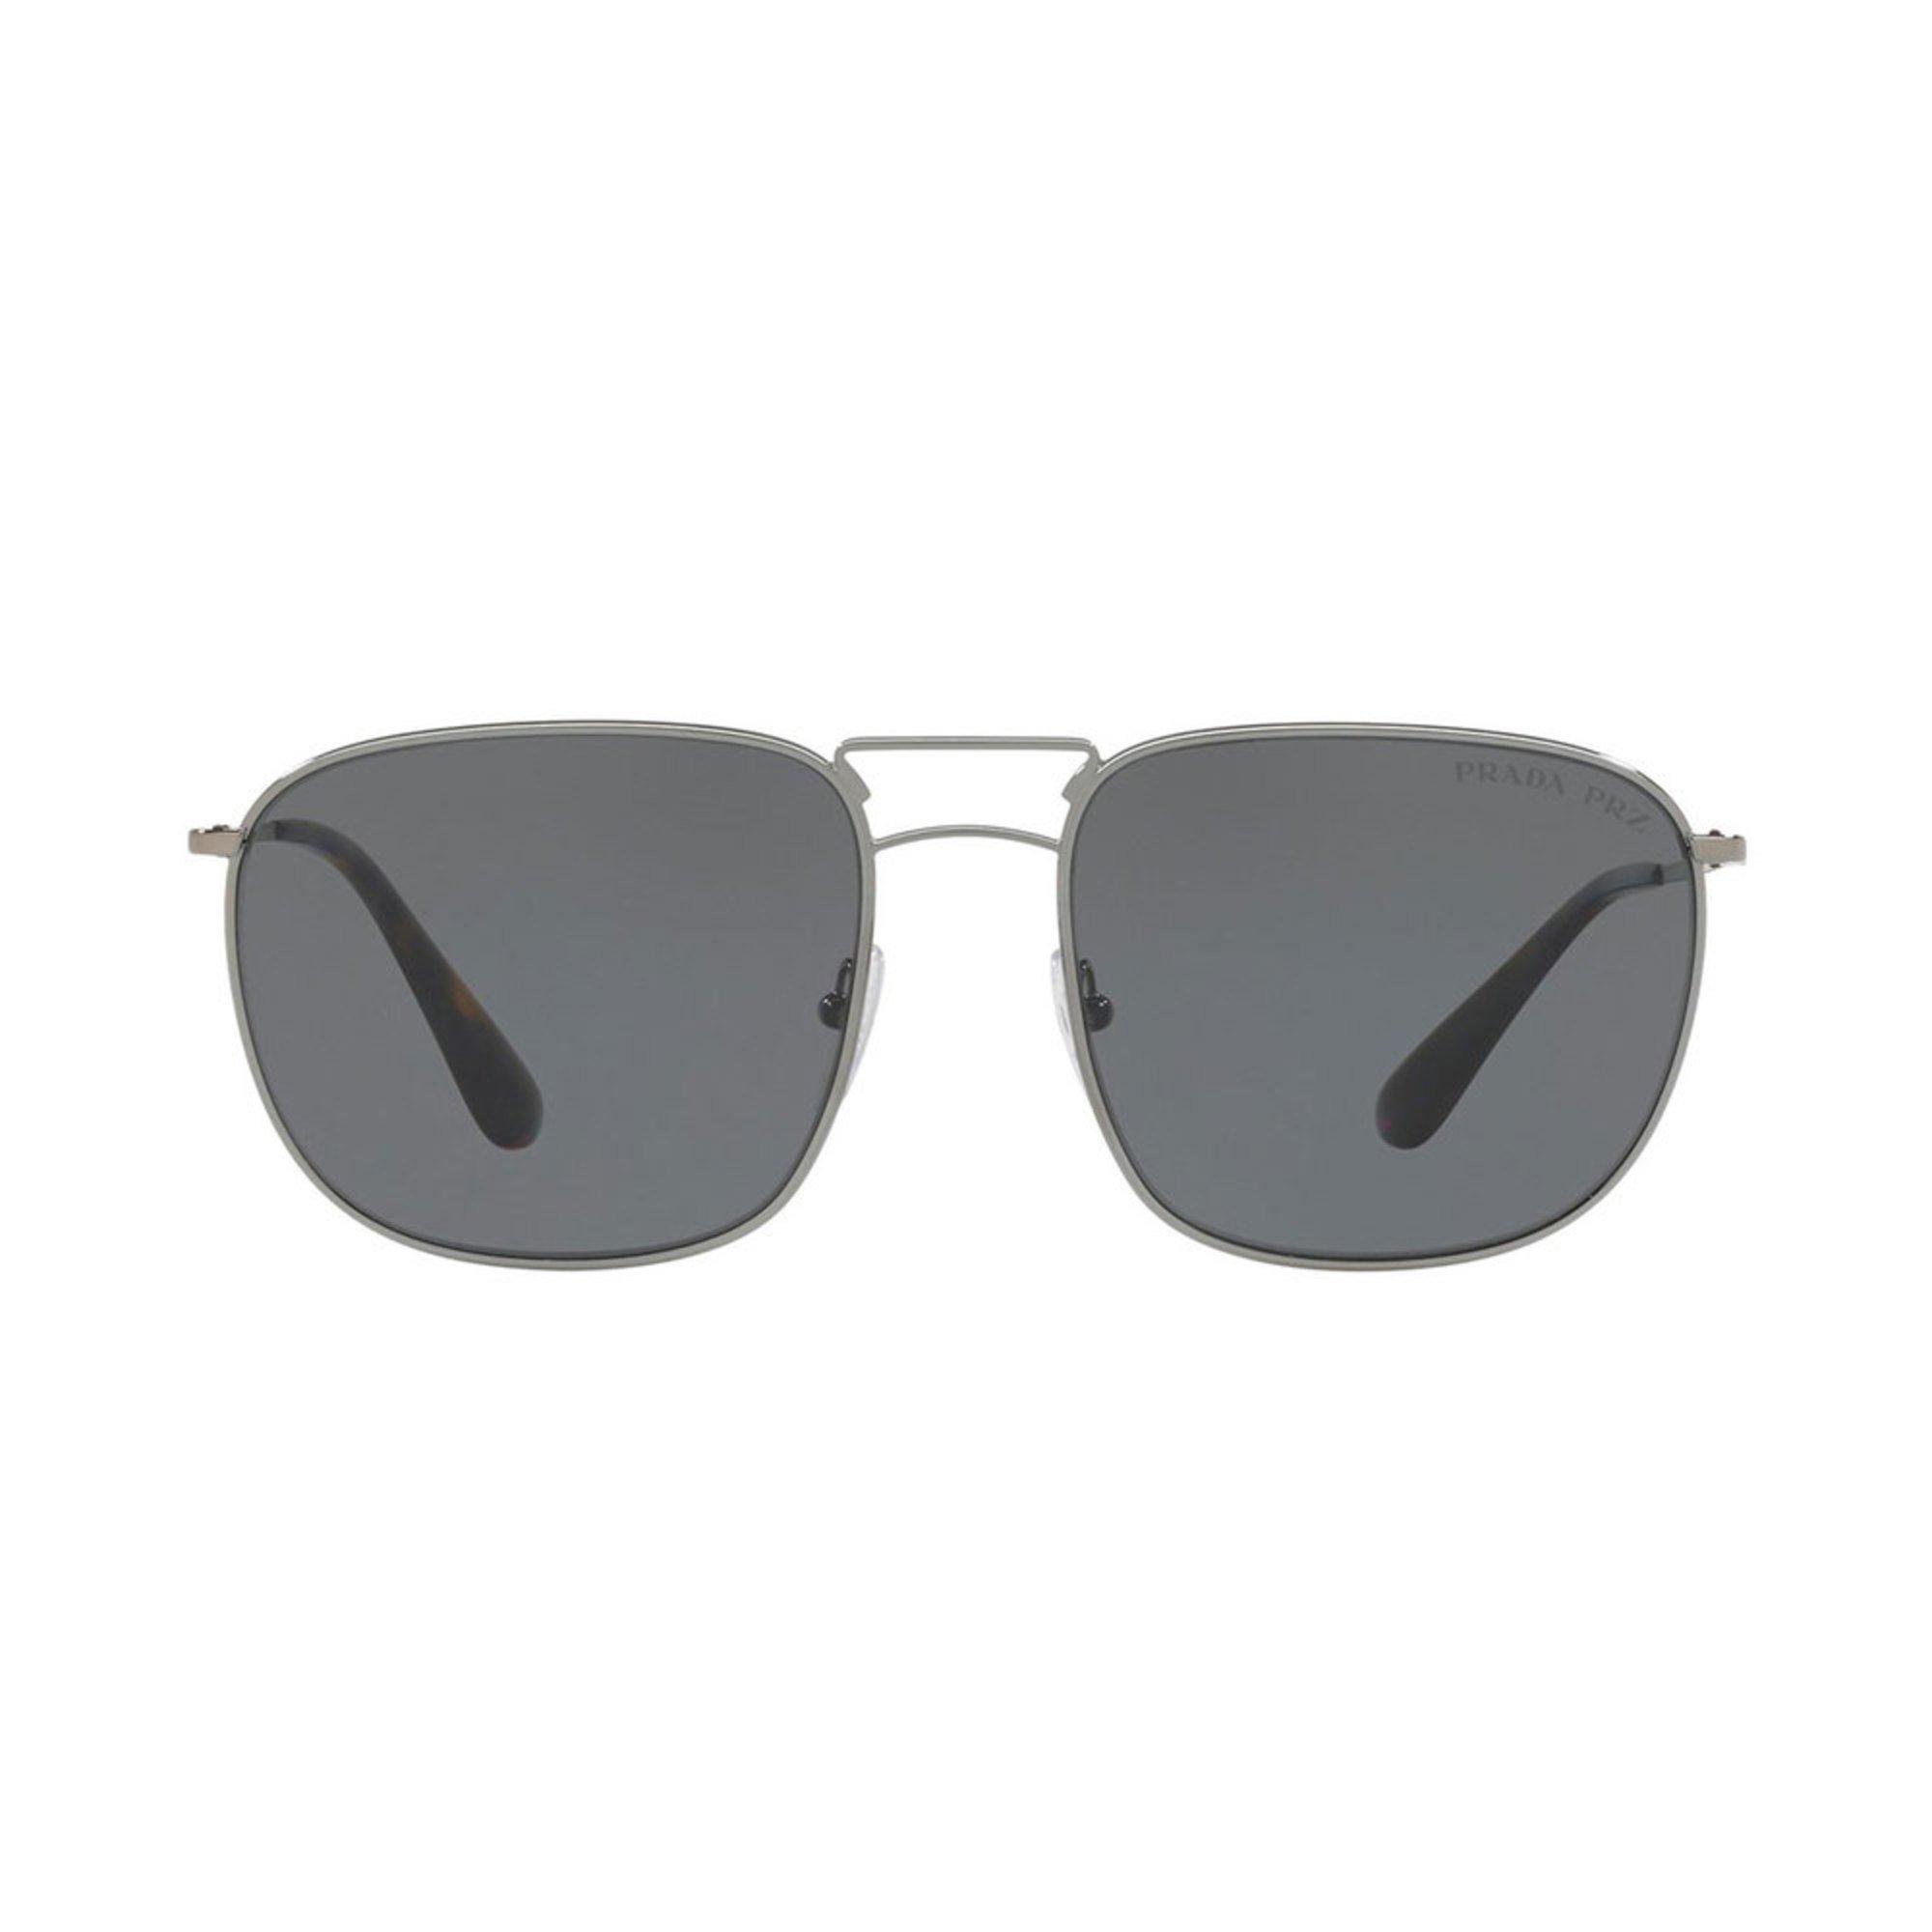 1917f3d6cd Prada. Prada Men s Polarized Pillow Sunglasses